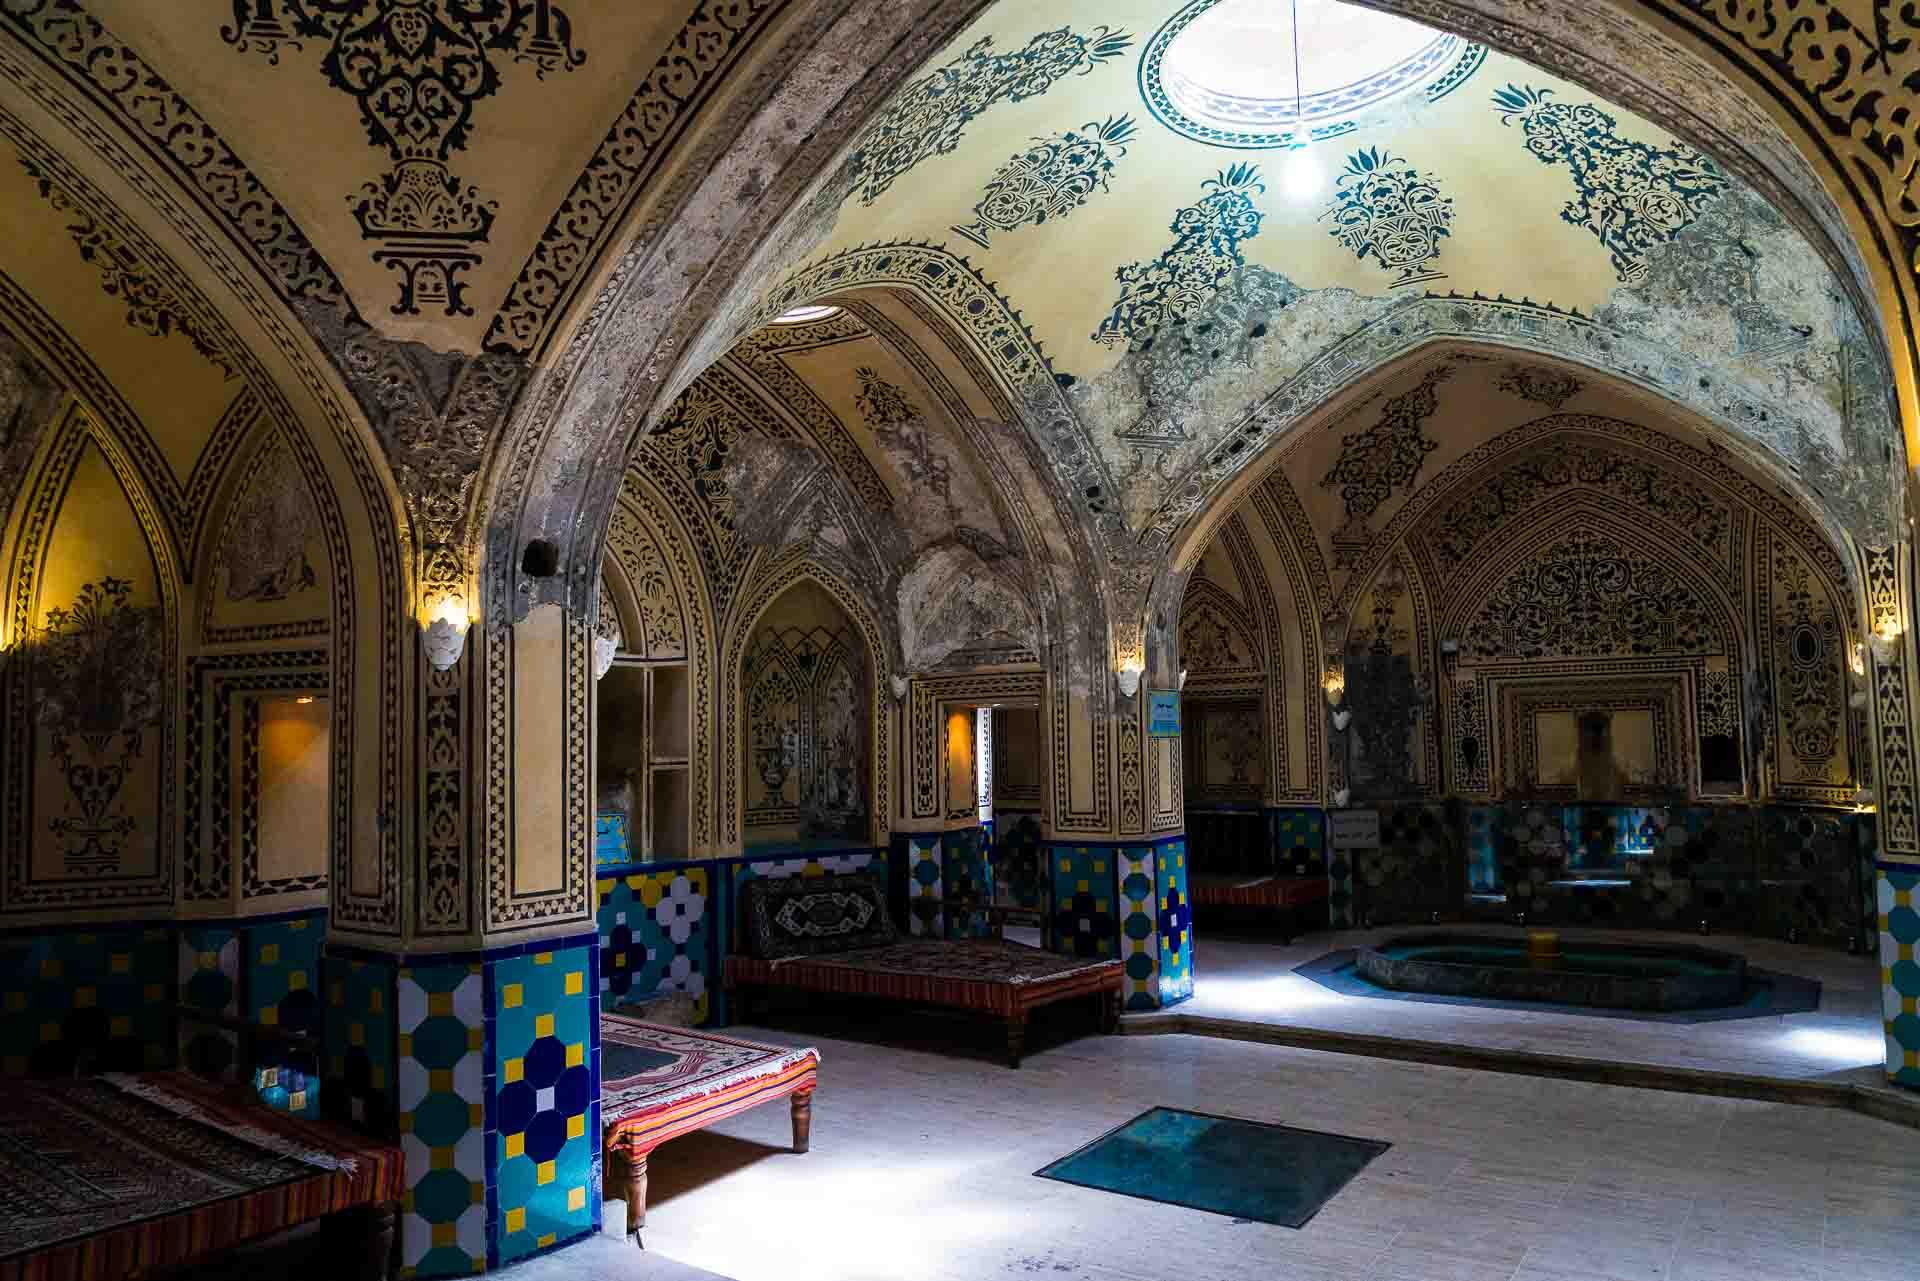 Sultan Amir Ahmad Bathhouse inside, kashan, iran, pescart, photo blog, travel blog, blog, photo travel blog, enrico pescantini, pescantini